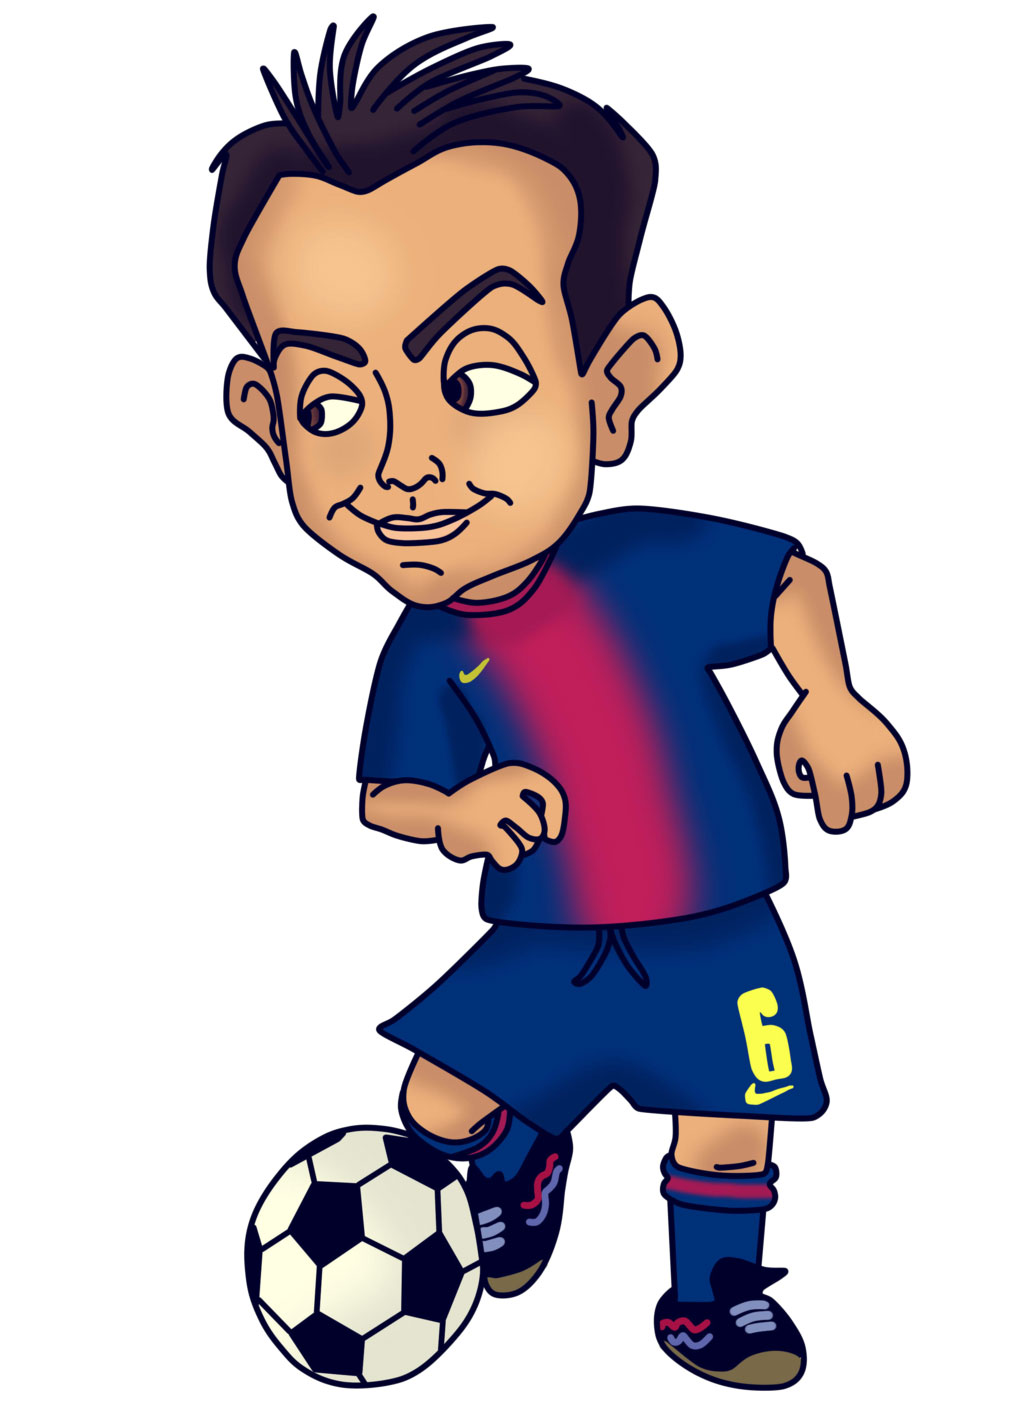 Best Soccer Player Mascot